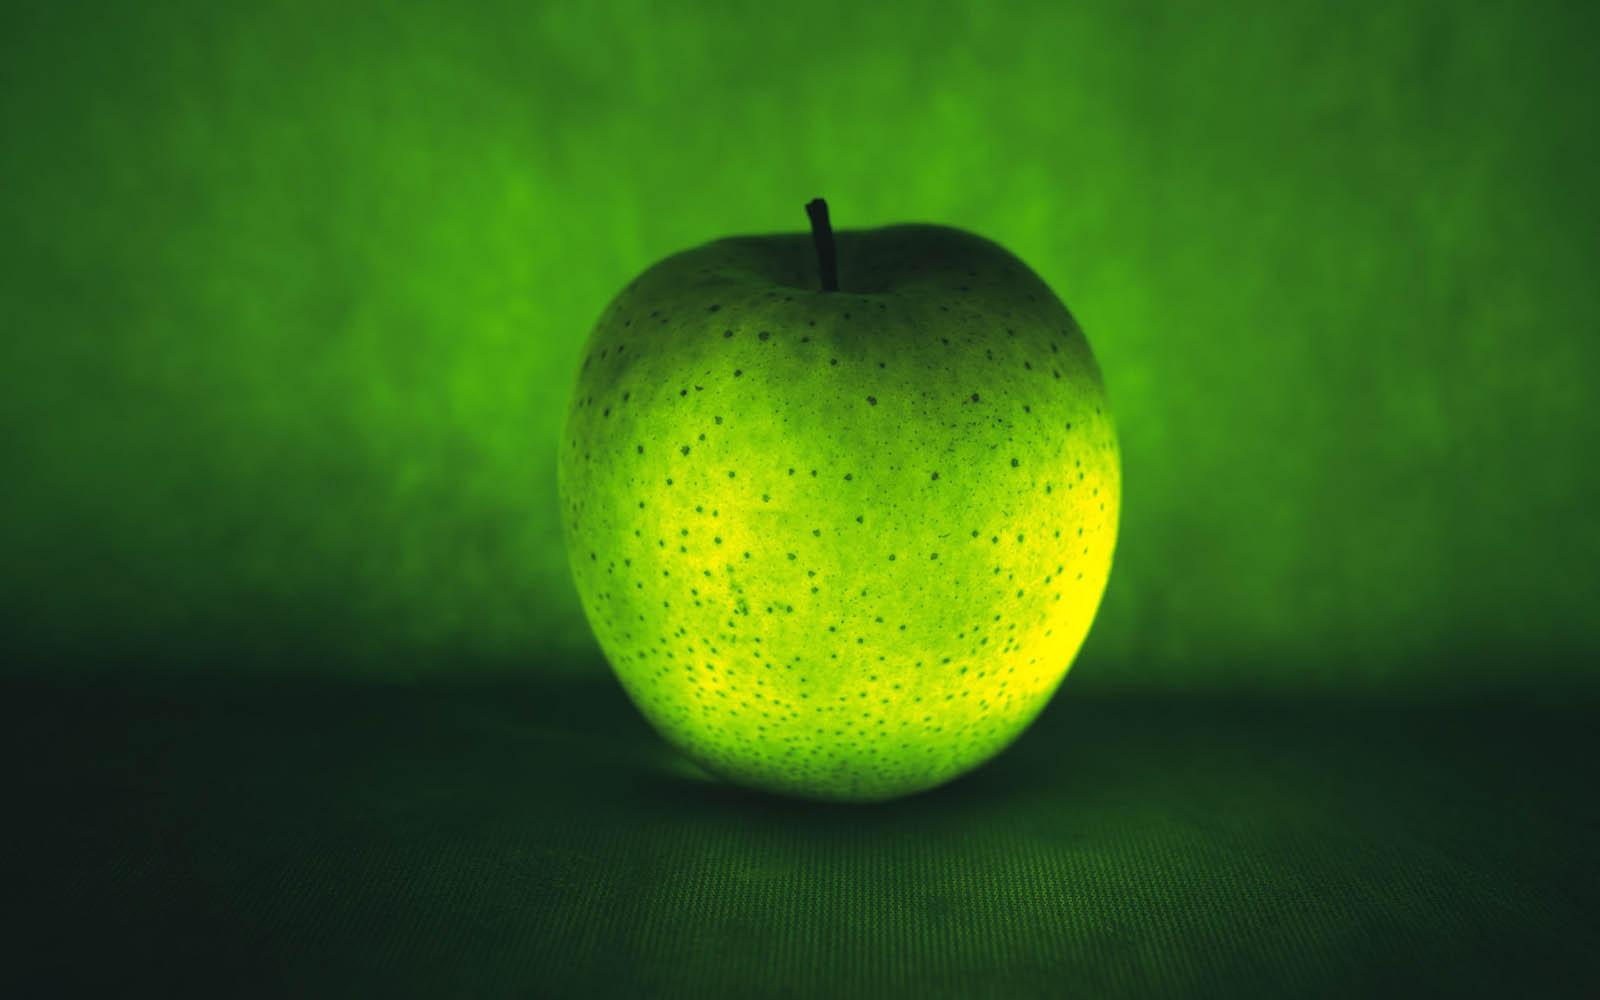 wallpaper: Green Apples Wallpapers